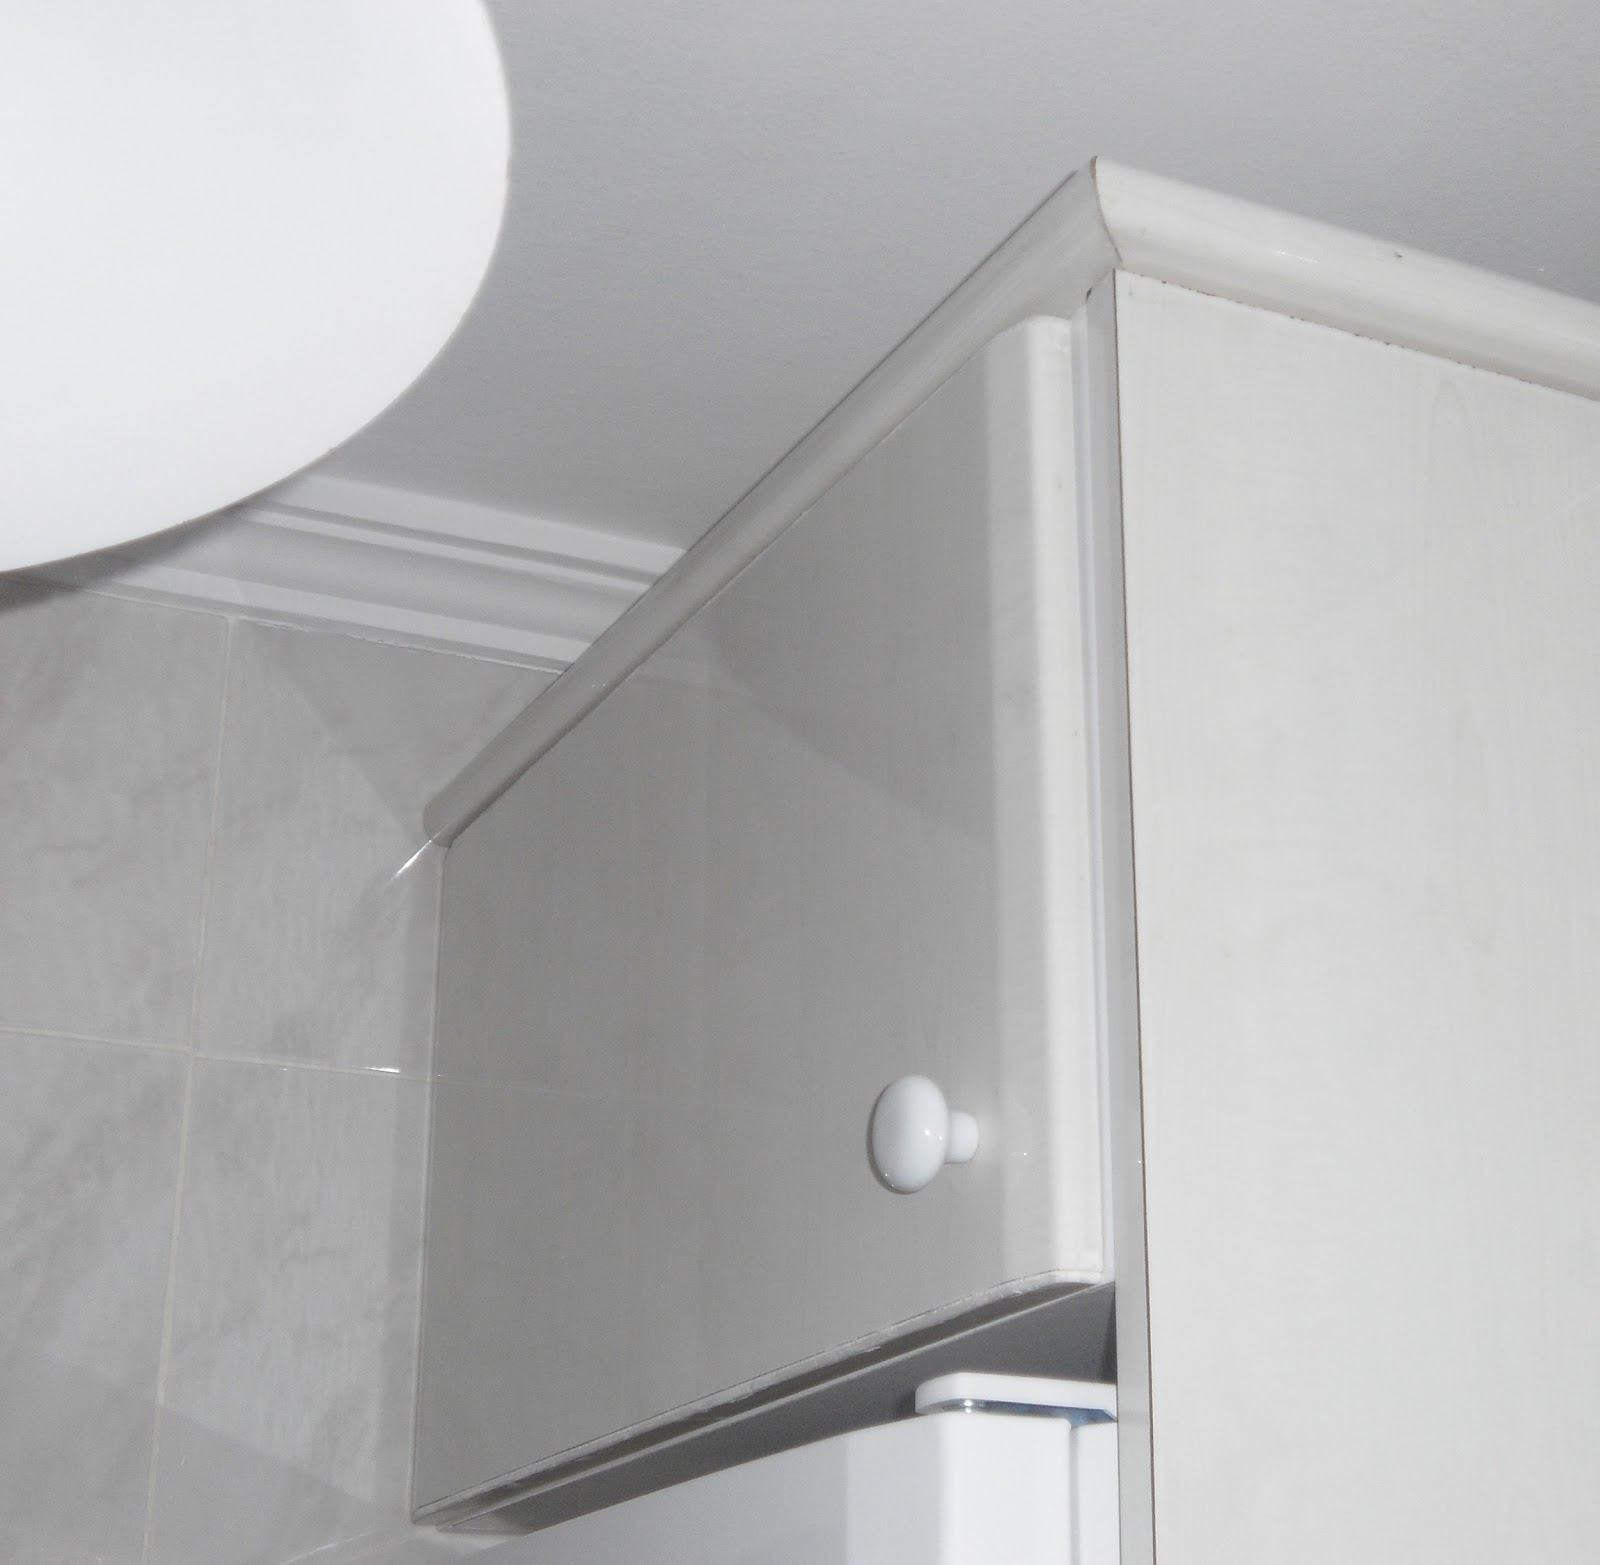 Caballito de cart n adaptar modulo de cocina encima del for Como montar muebles de cocina